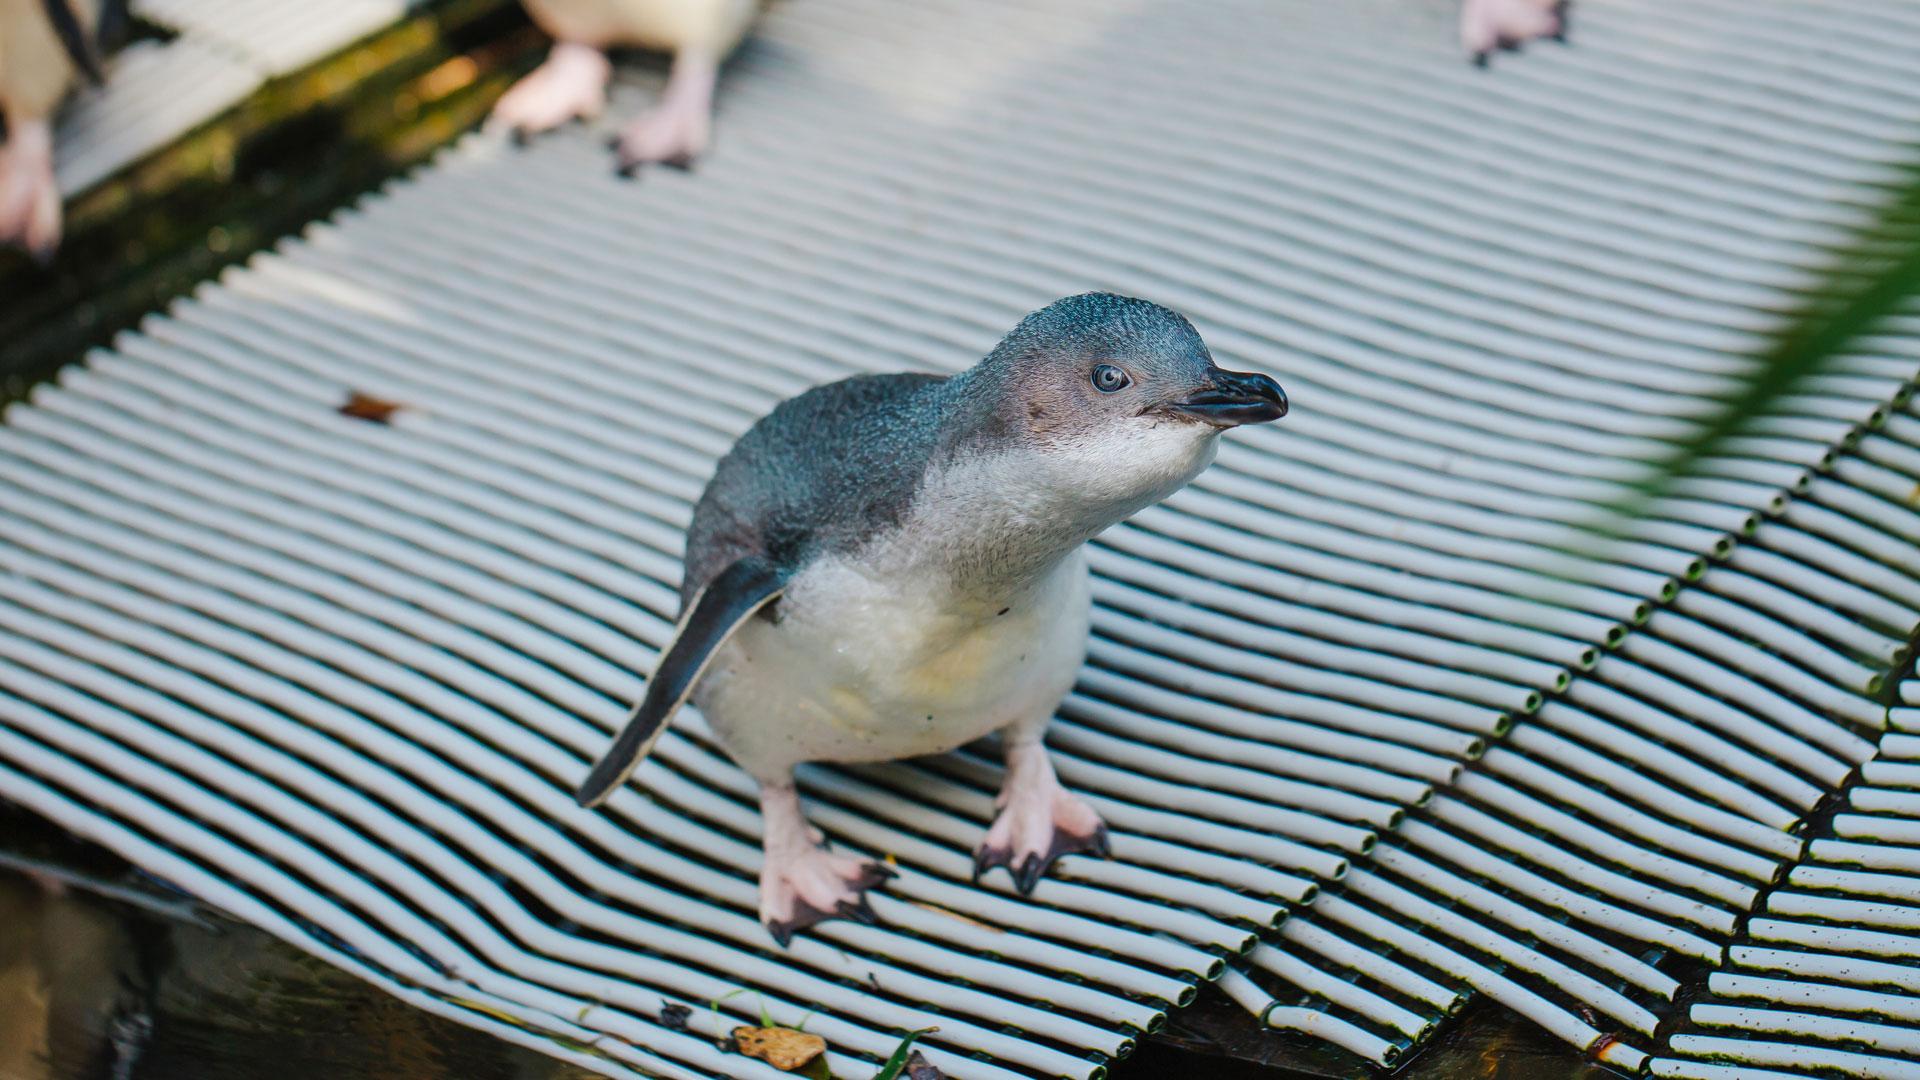 https://rfacdn.nz/zoo/assets/media/little-penguin-paku-gallery-4.jpg